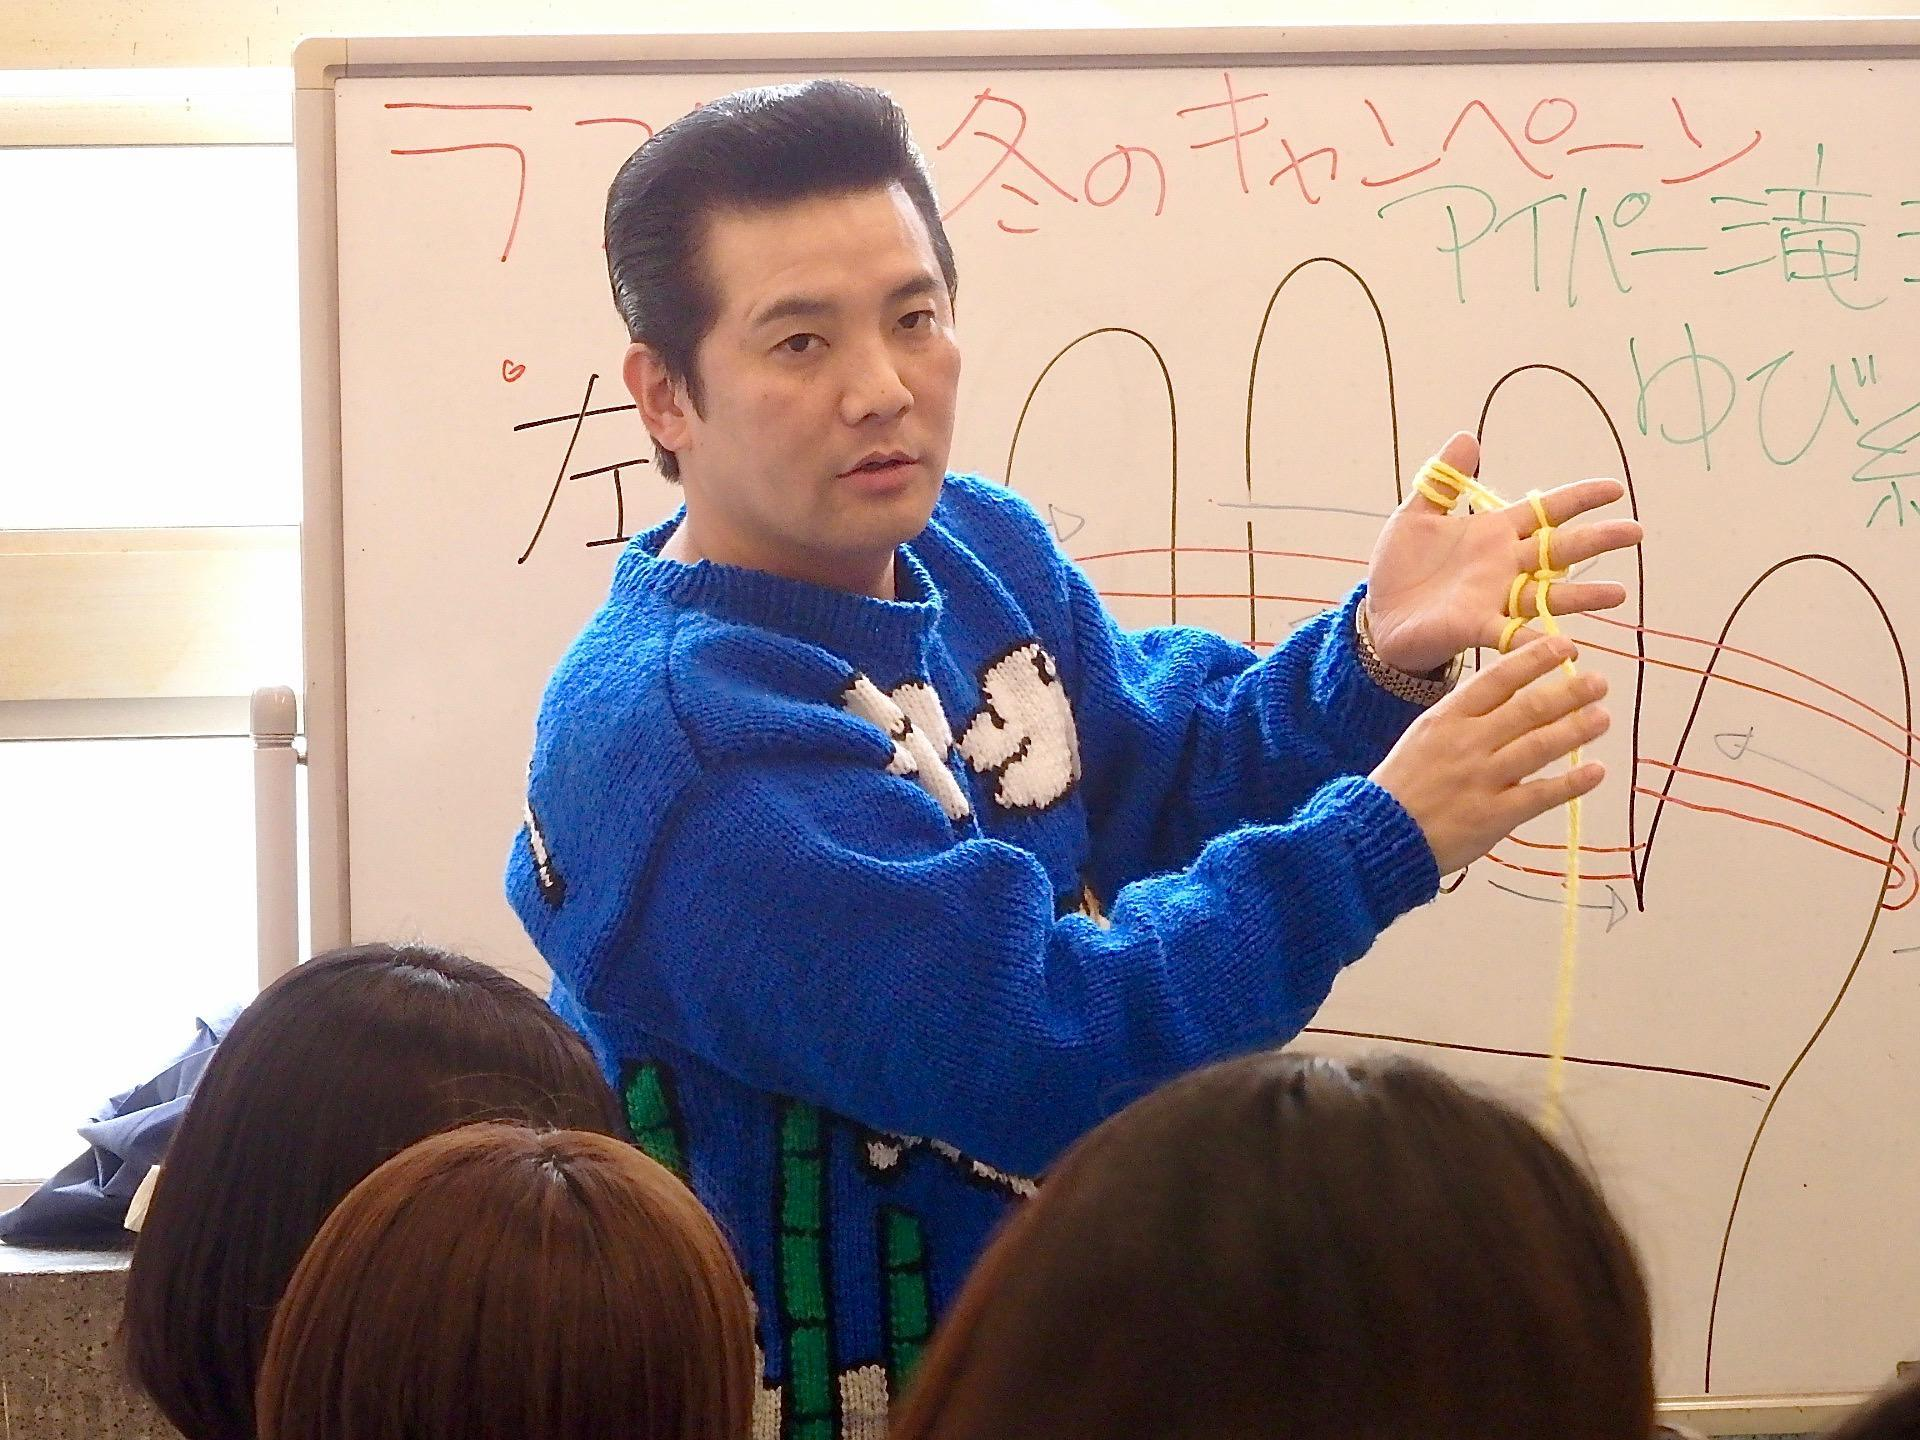 http://news.yoshimoto.co.jp/20180215065838-319c7d20aaef209b5cd7adf7dd7c97aa42f9c652.jpg